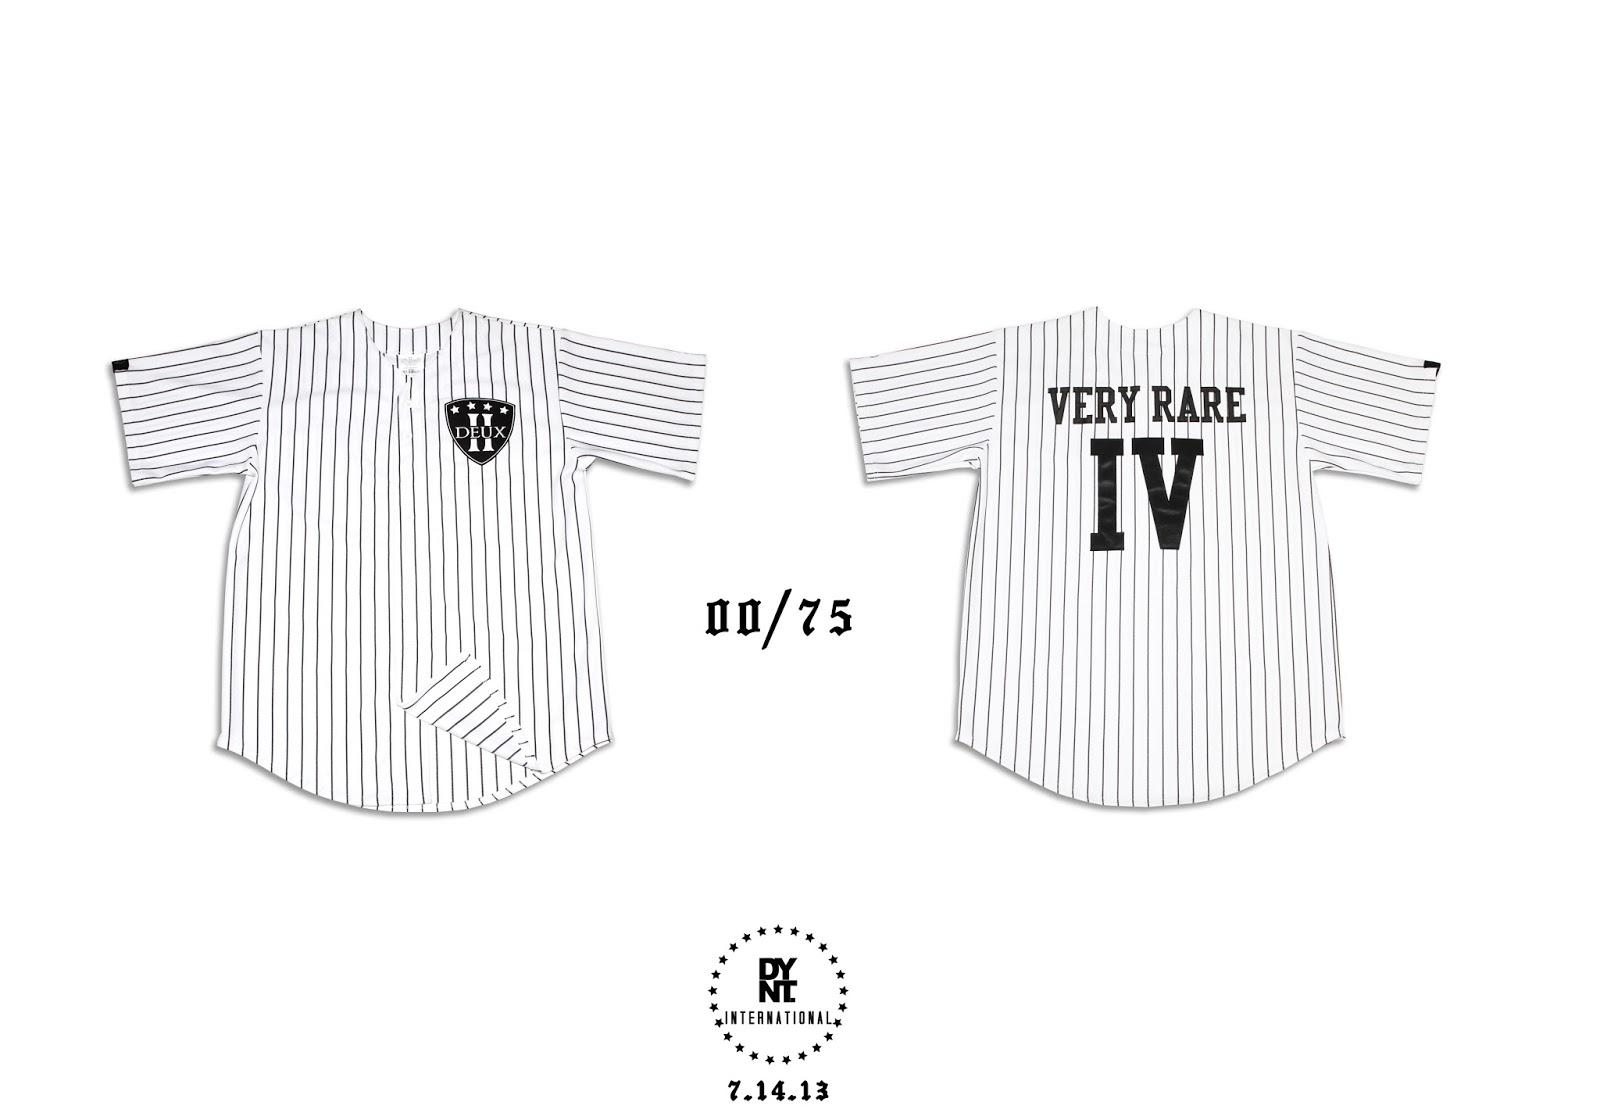 blank printable baseball jersey template online marketing consultancy consultants strategist. Black Bedroom Furniture Sets. Home Design Ideas